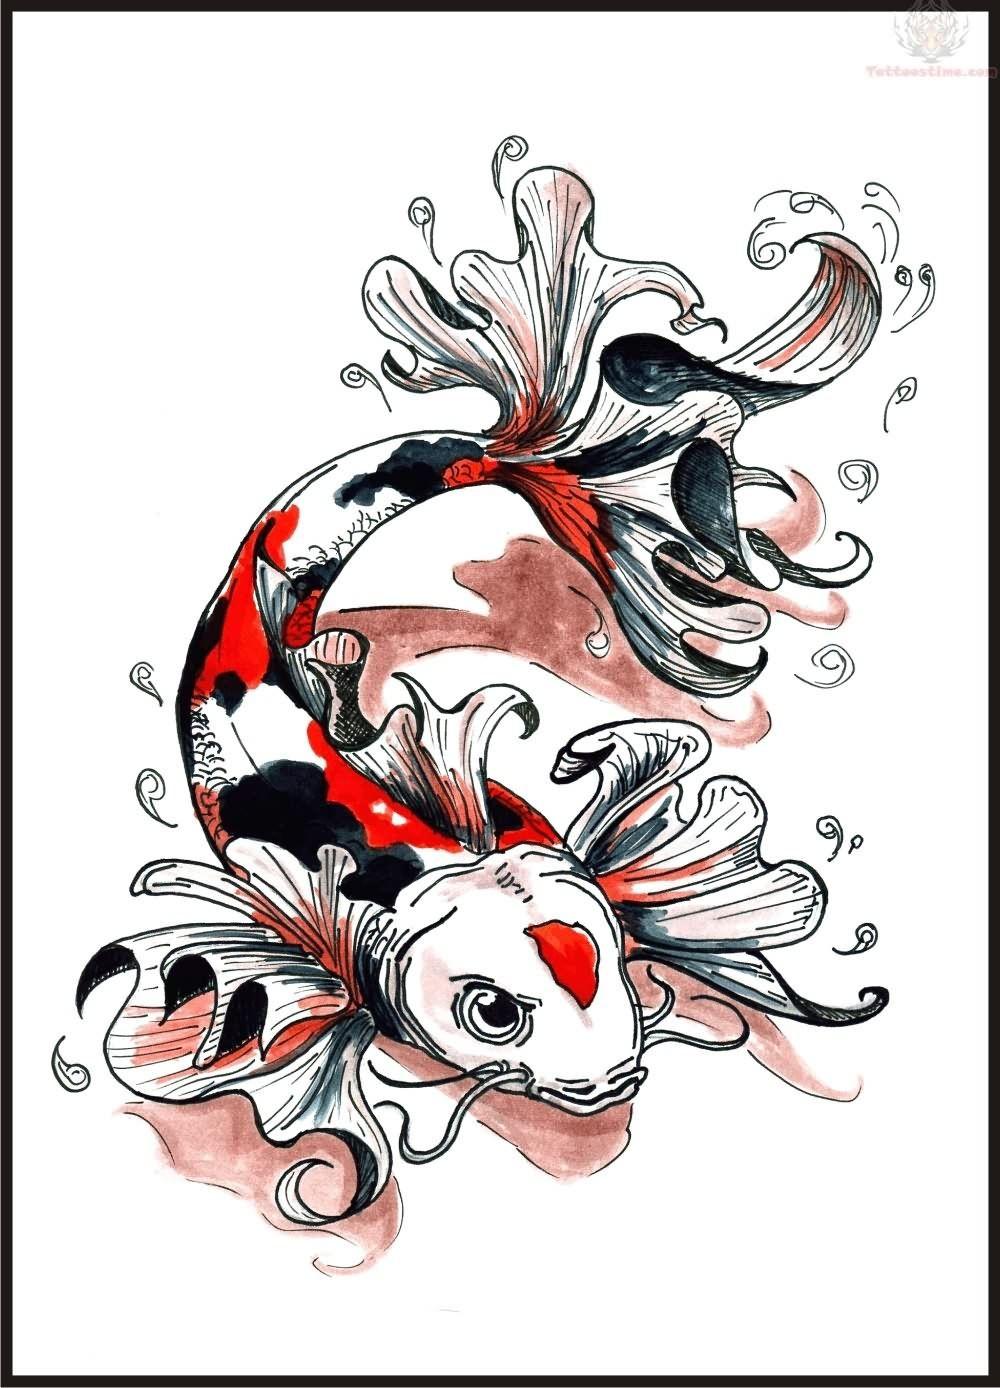 Koi tattoo design meaning symbolism probably surprising to many koi tattoo design meaning symbolism probably surprising to many westerners is the large of amount biocorpaavc